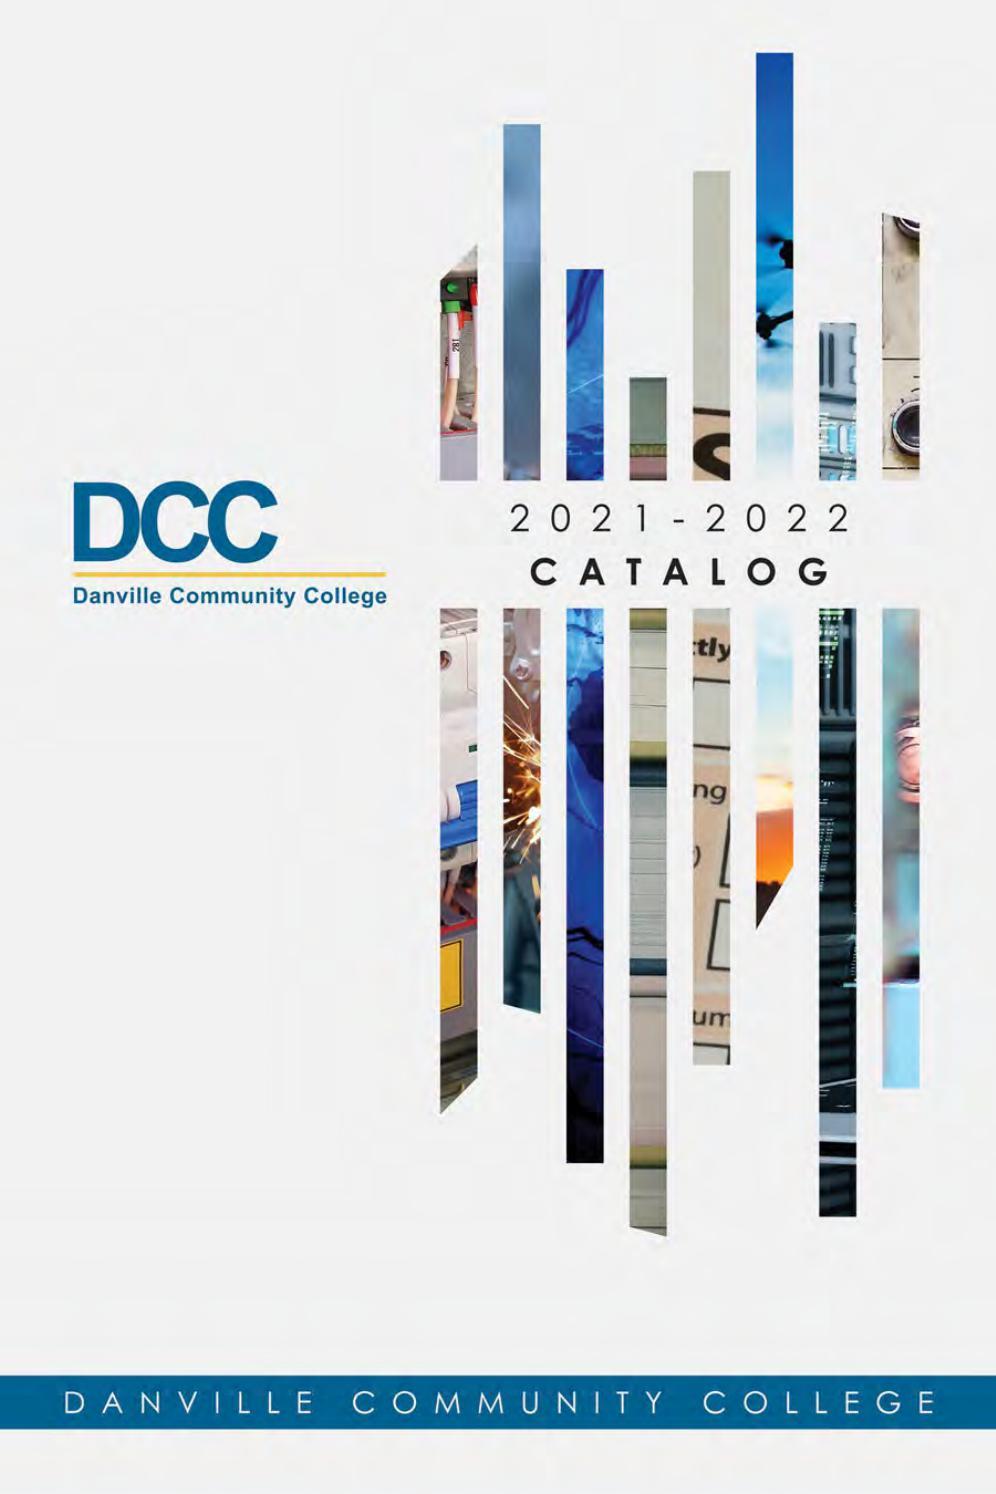 Uml Academic Calendar Spring 2022.Dcc Catalog 2021 2022 By Danville Community College Issuu